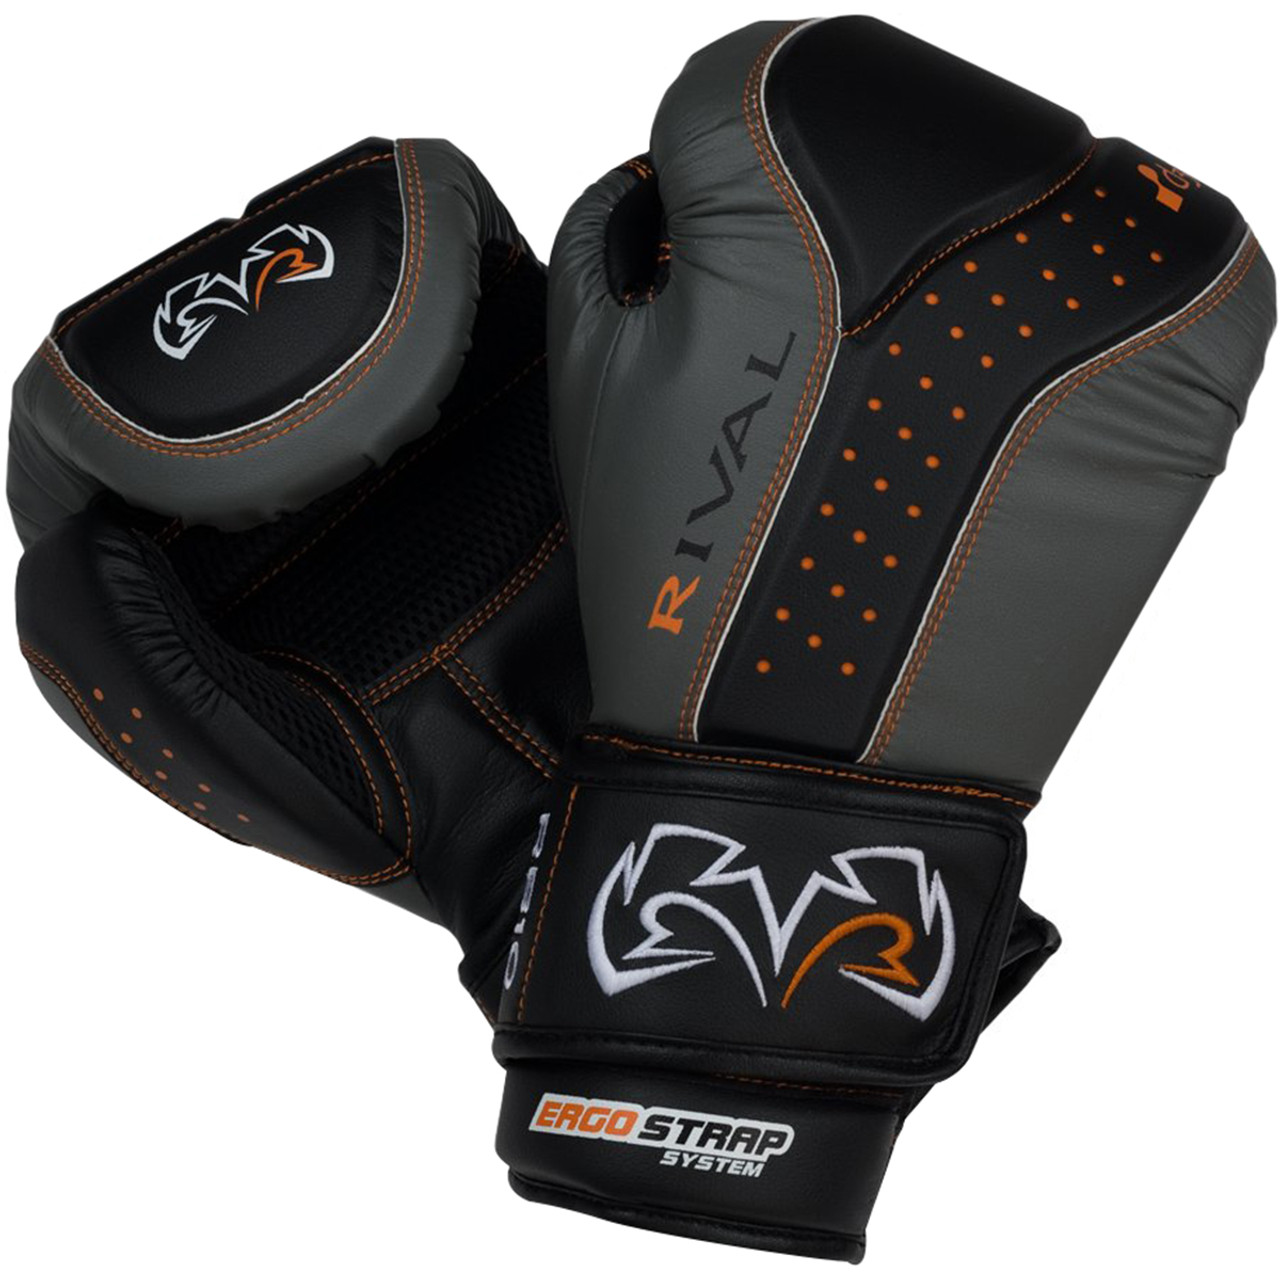 Black//Gray Rival Boxing d3o Intelli-Shock Bag Gloves